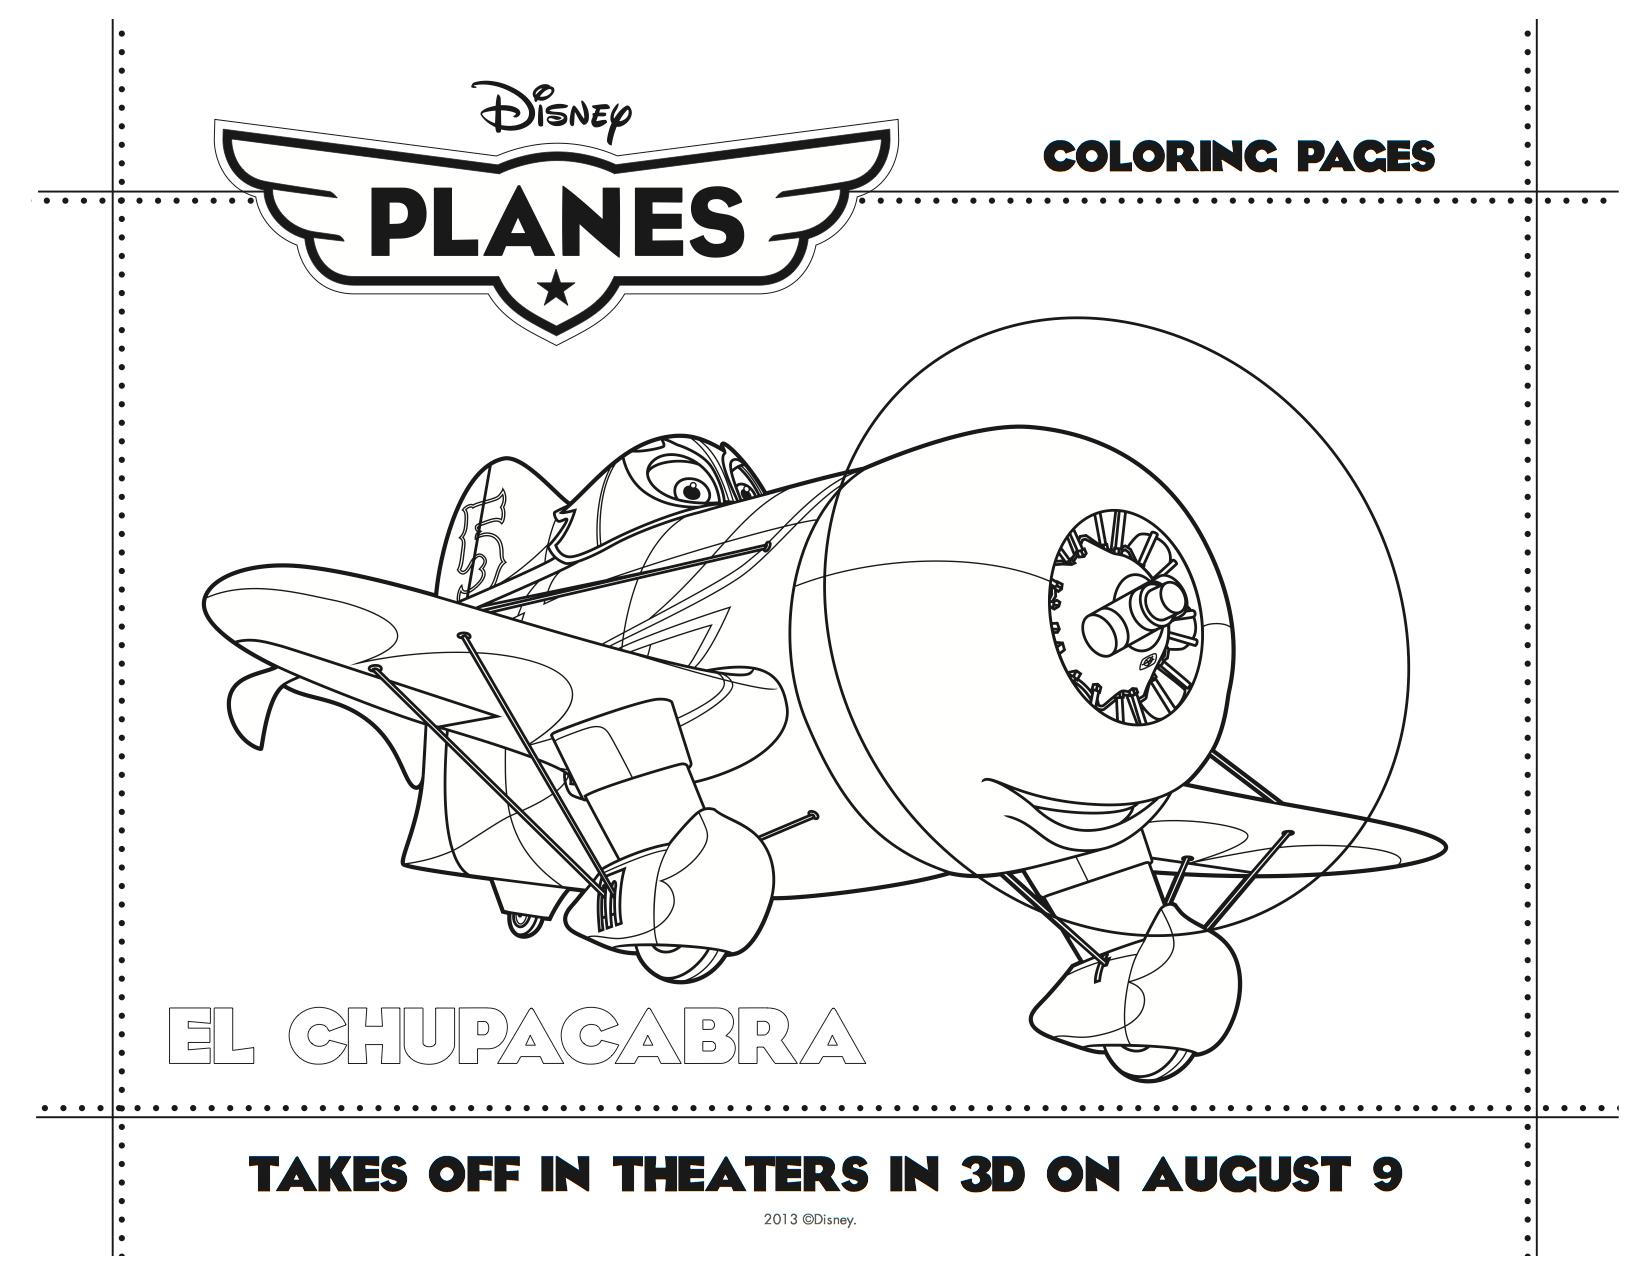 disney planes printable el chupacabra coloring sheet mama likes this